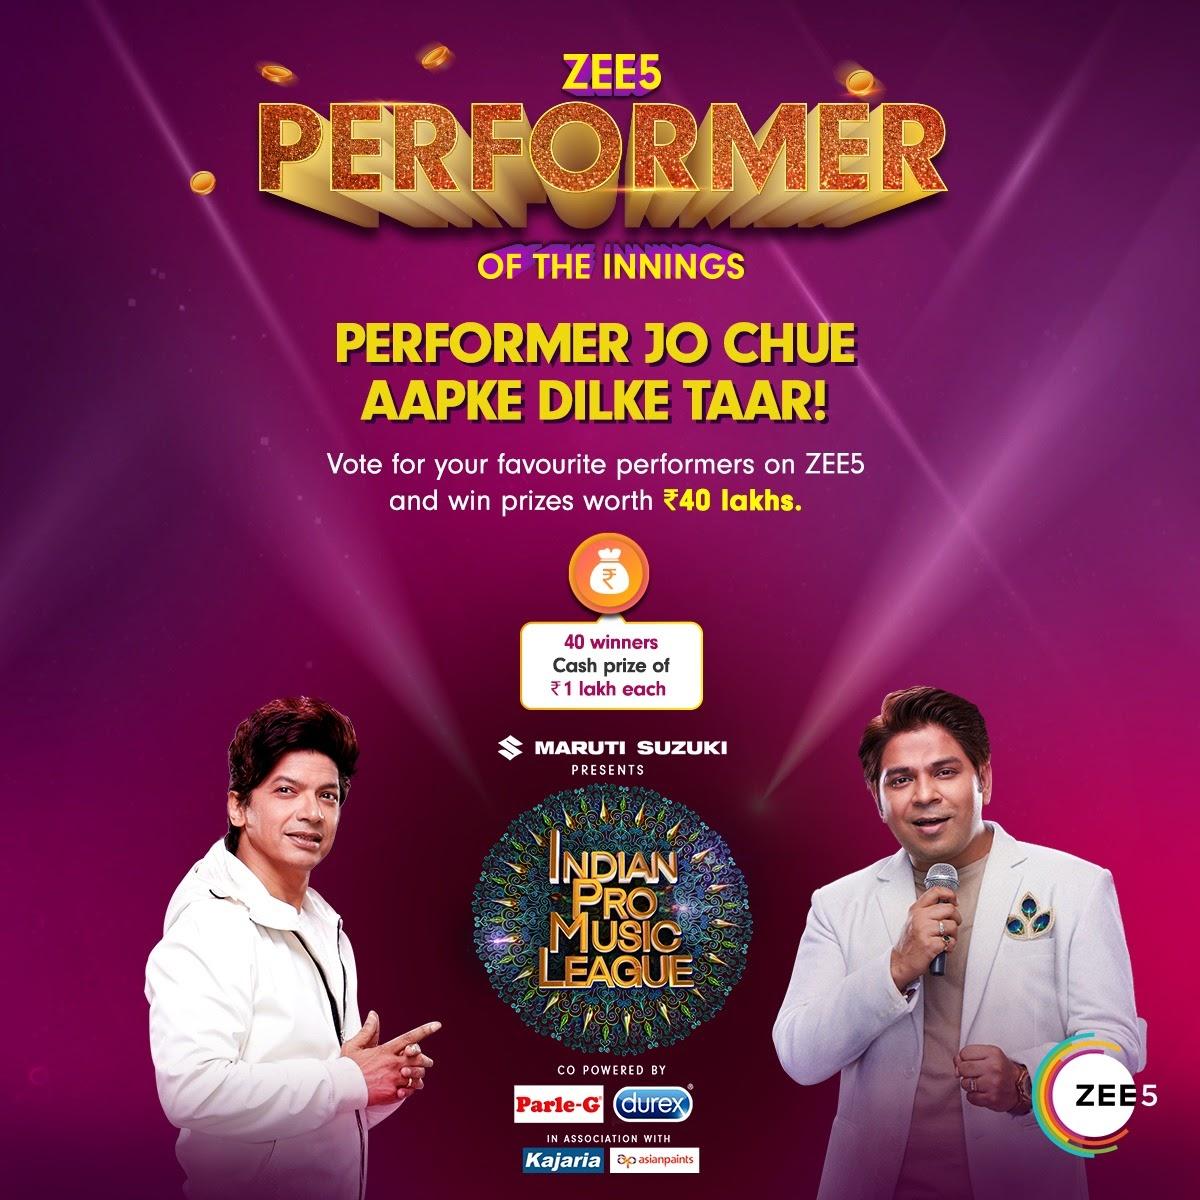 Dabbangs aur Tigers ke beech chhid gayi hai musical jung! Aap kiski side par ho? Vote and win with #IndianProMusicLeague on #ZEE5. Ab mil kar naara lagao #MusicUnchaRaheHamara!  Watch:   #ZEE5 #IndianProMusicLeague #IPMLonZEE5  #MusicUnchaRaheHamara